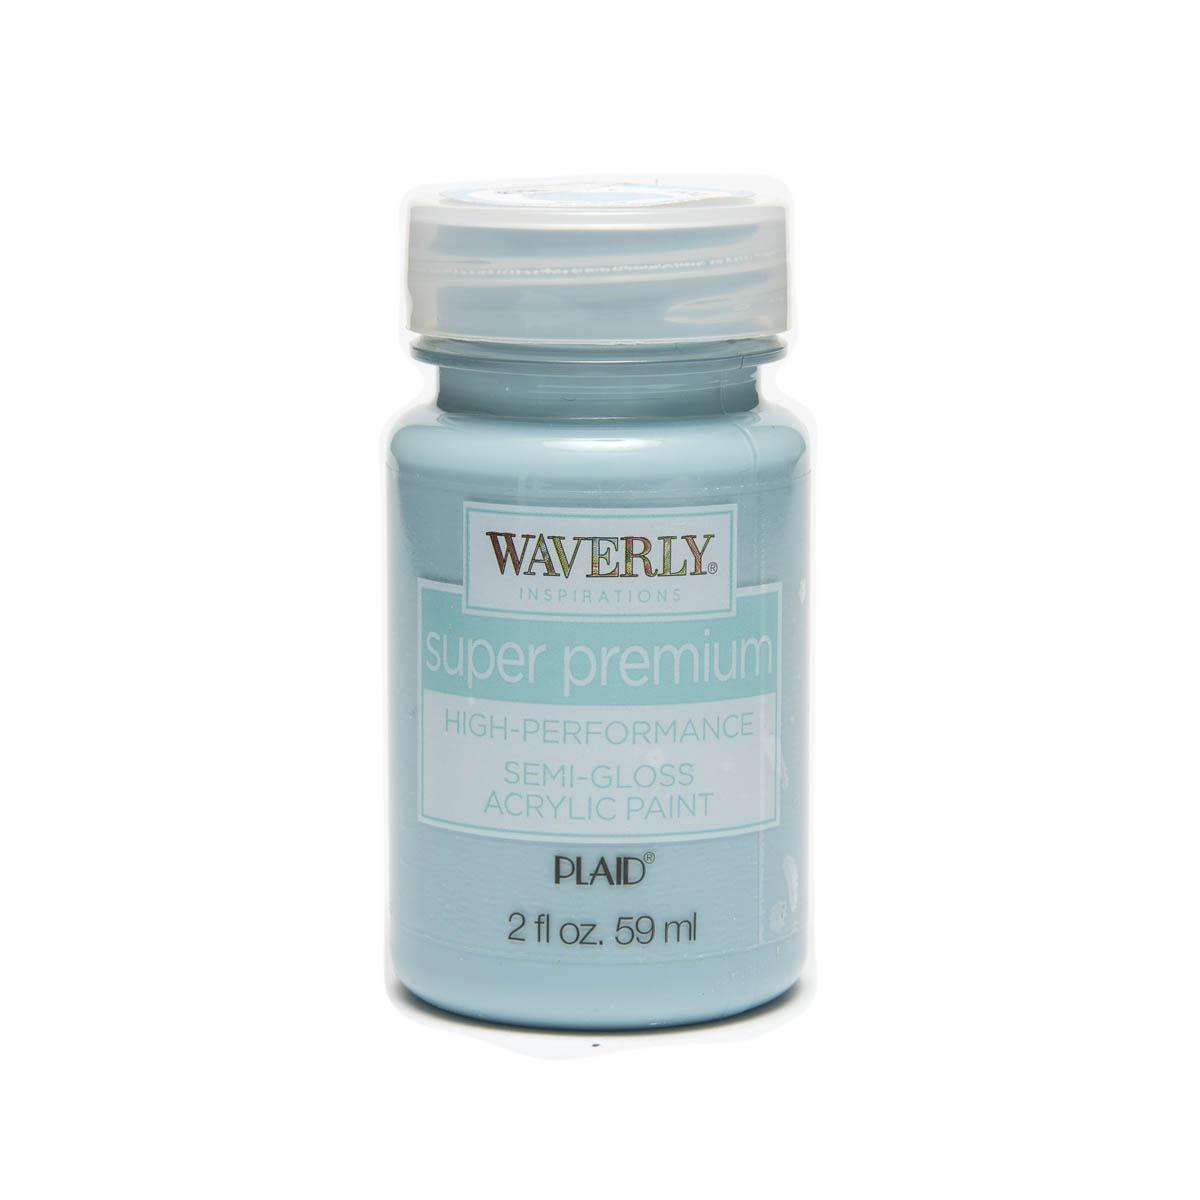 Waverly ® Inspirations Super Premium Semi-Gloss Acrylic Paint - Pool, 2 oz.